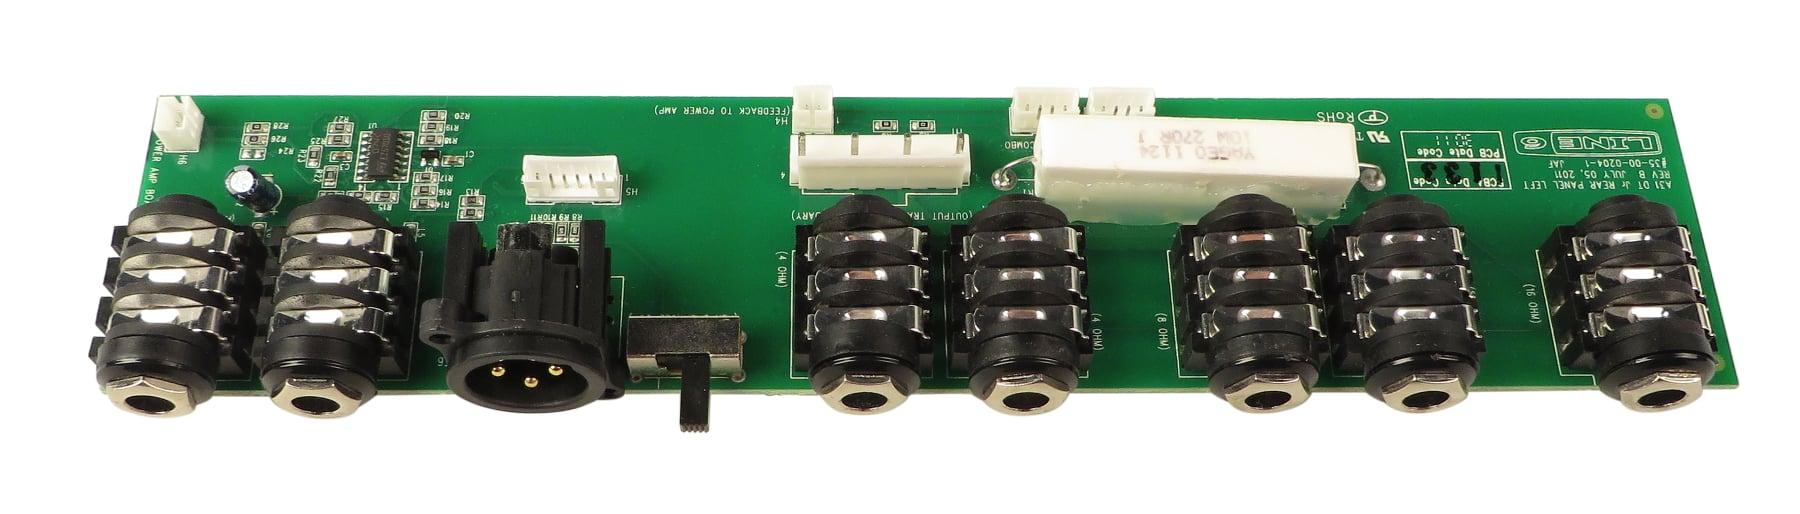 Back Panel PCB Assembly for DT25